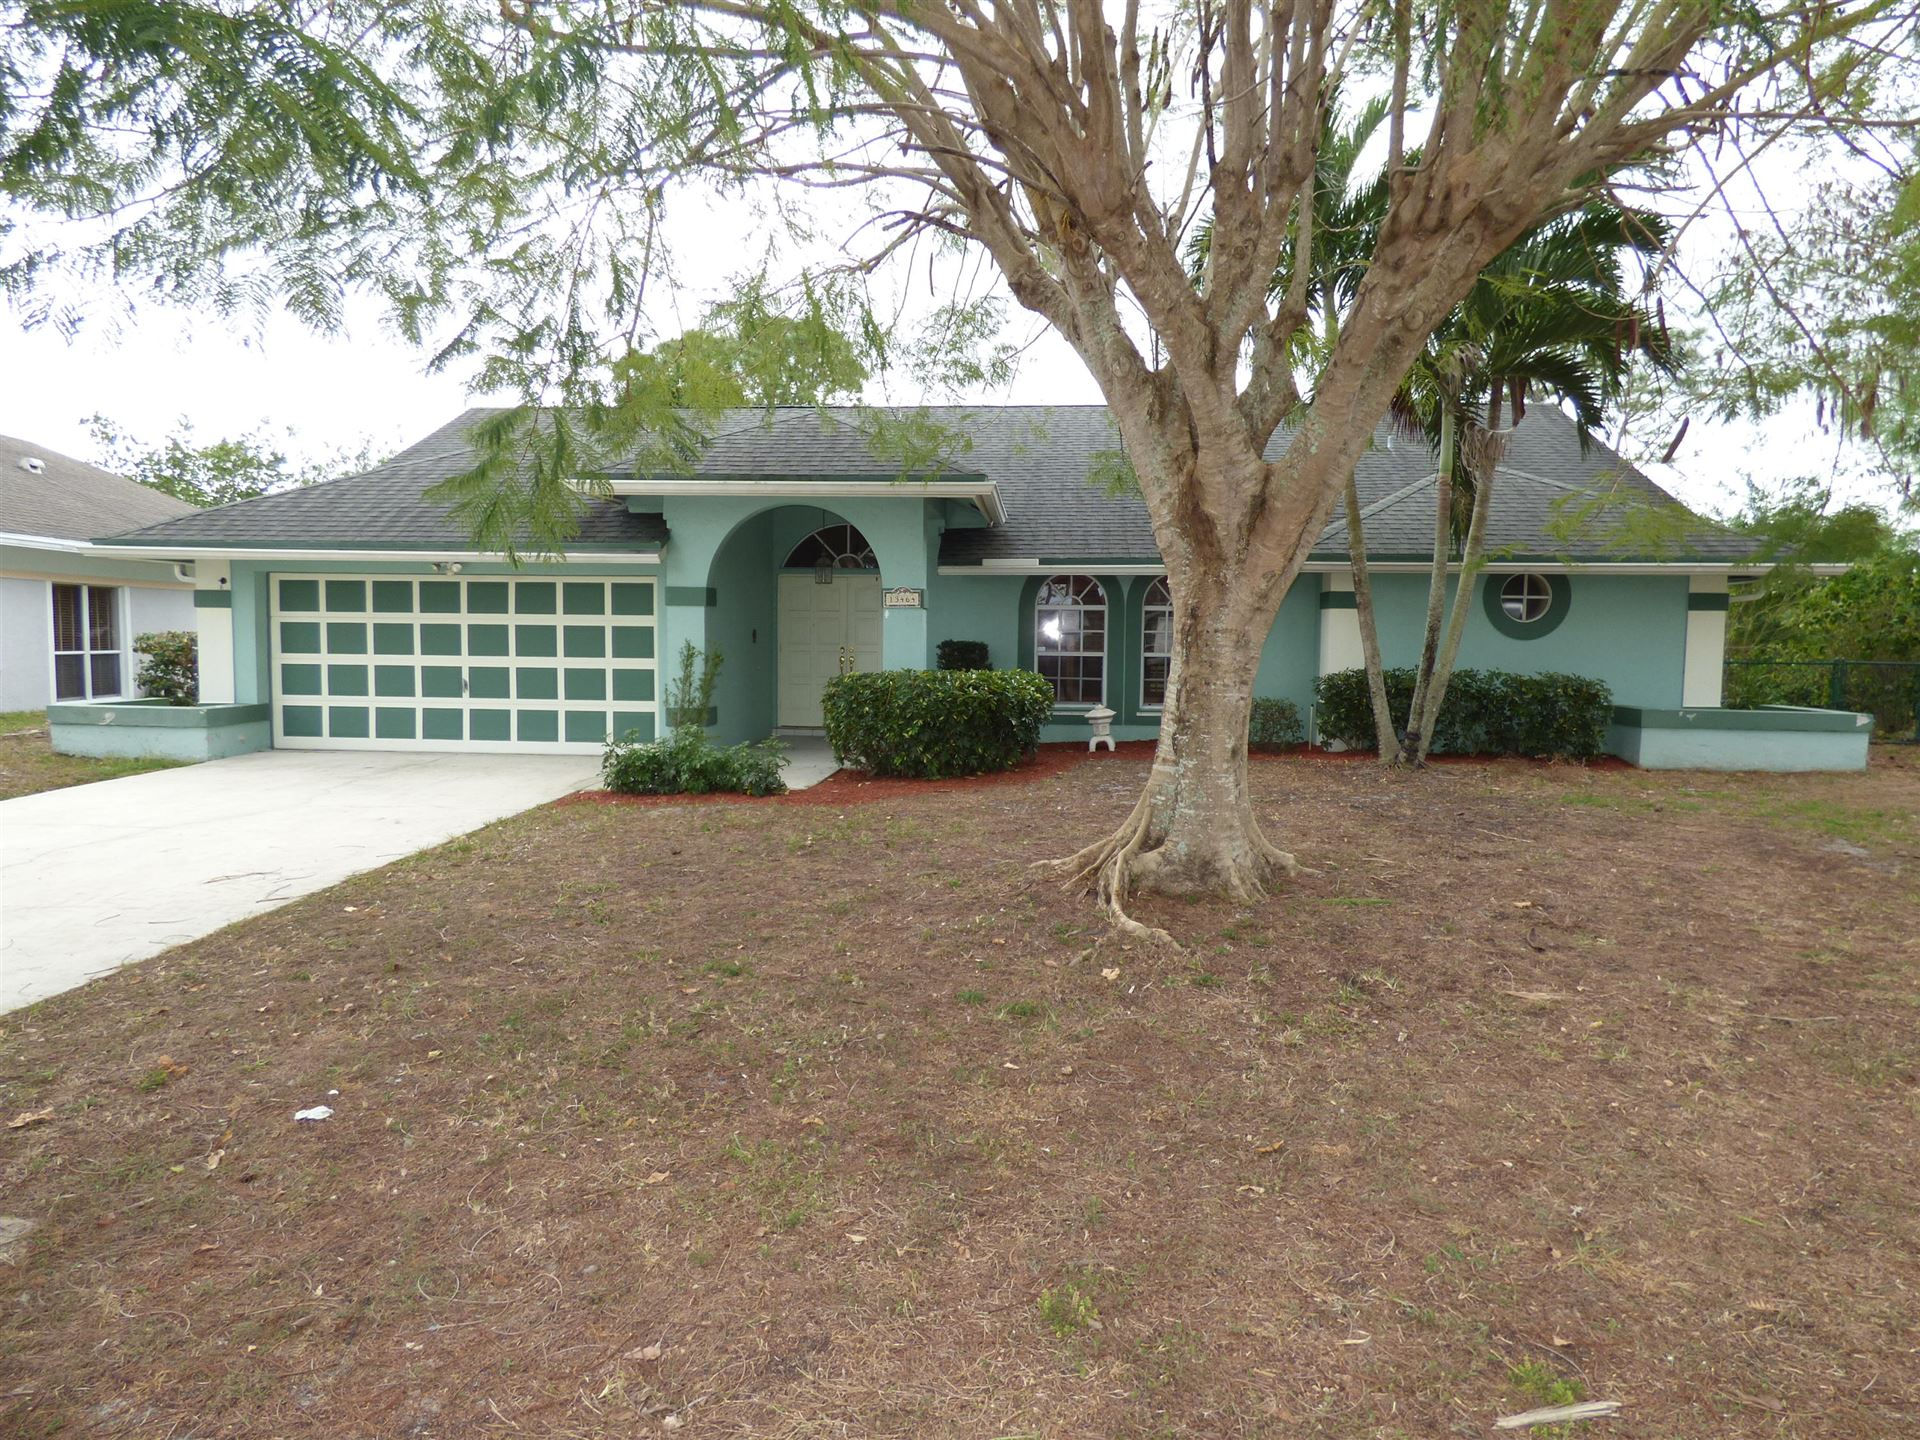 13464 Hyacinth Court, Wellington, FL 33414 - #: RX-10705059